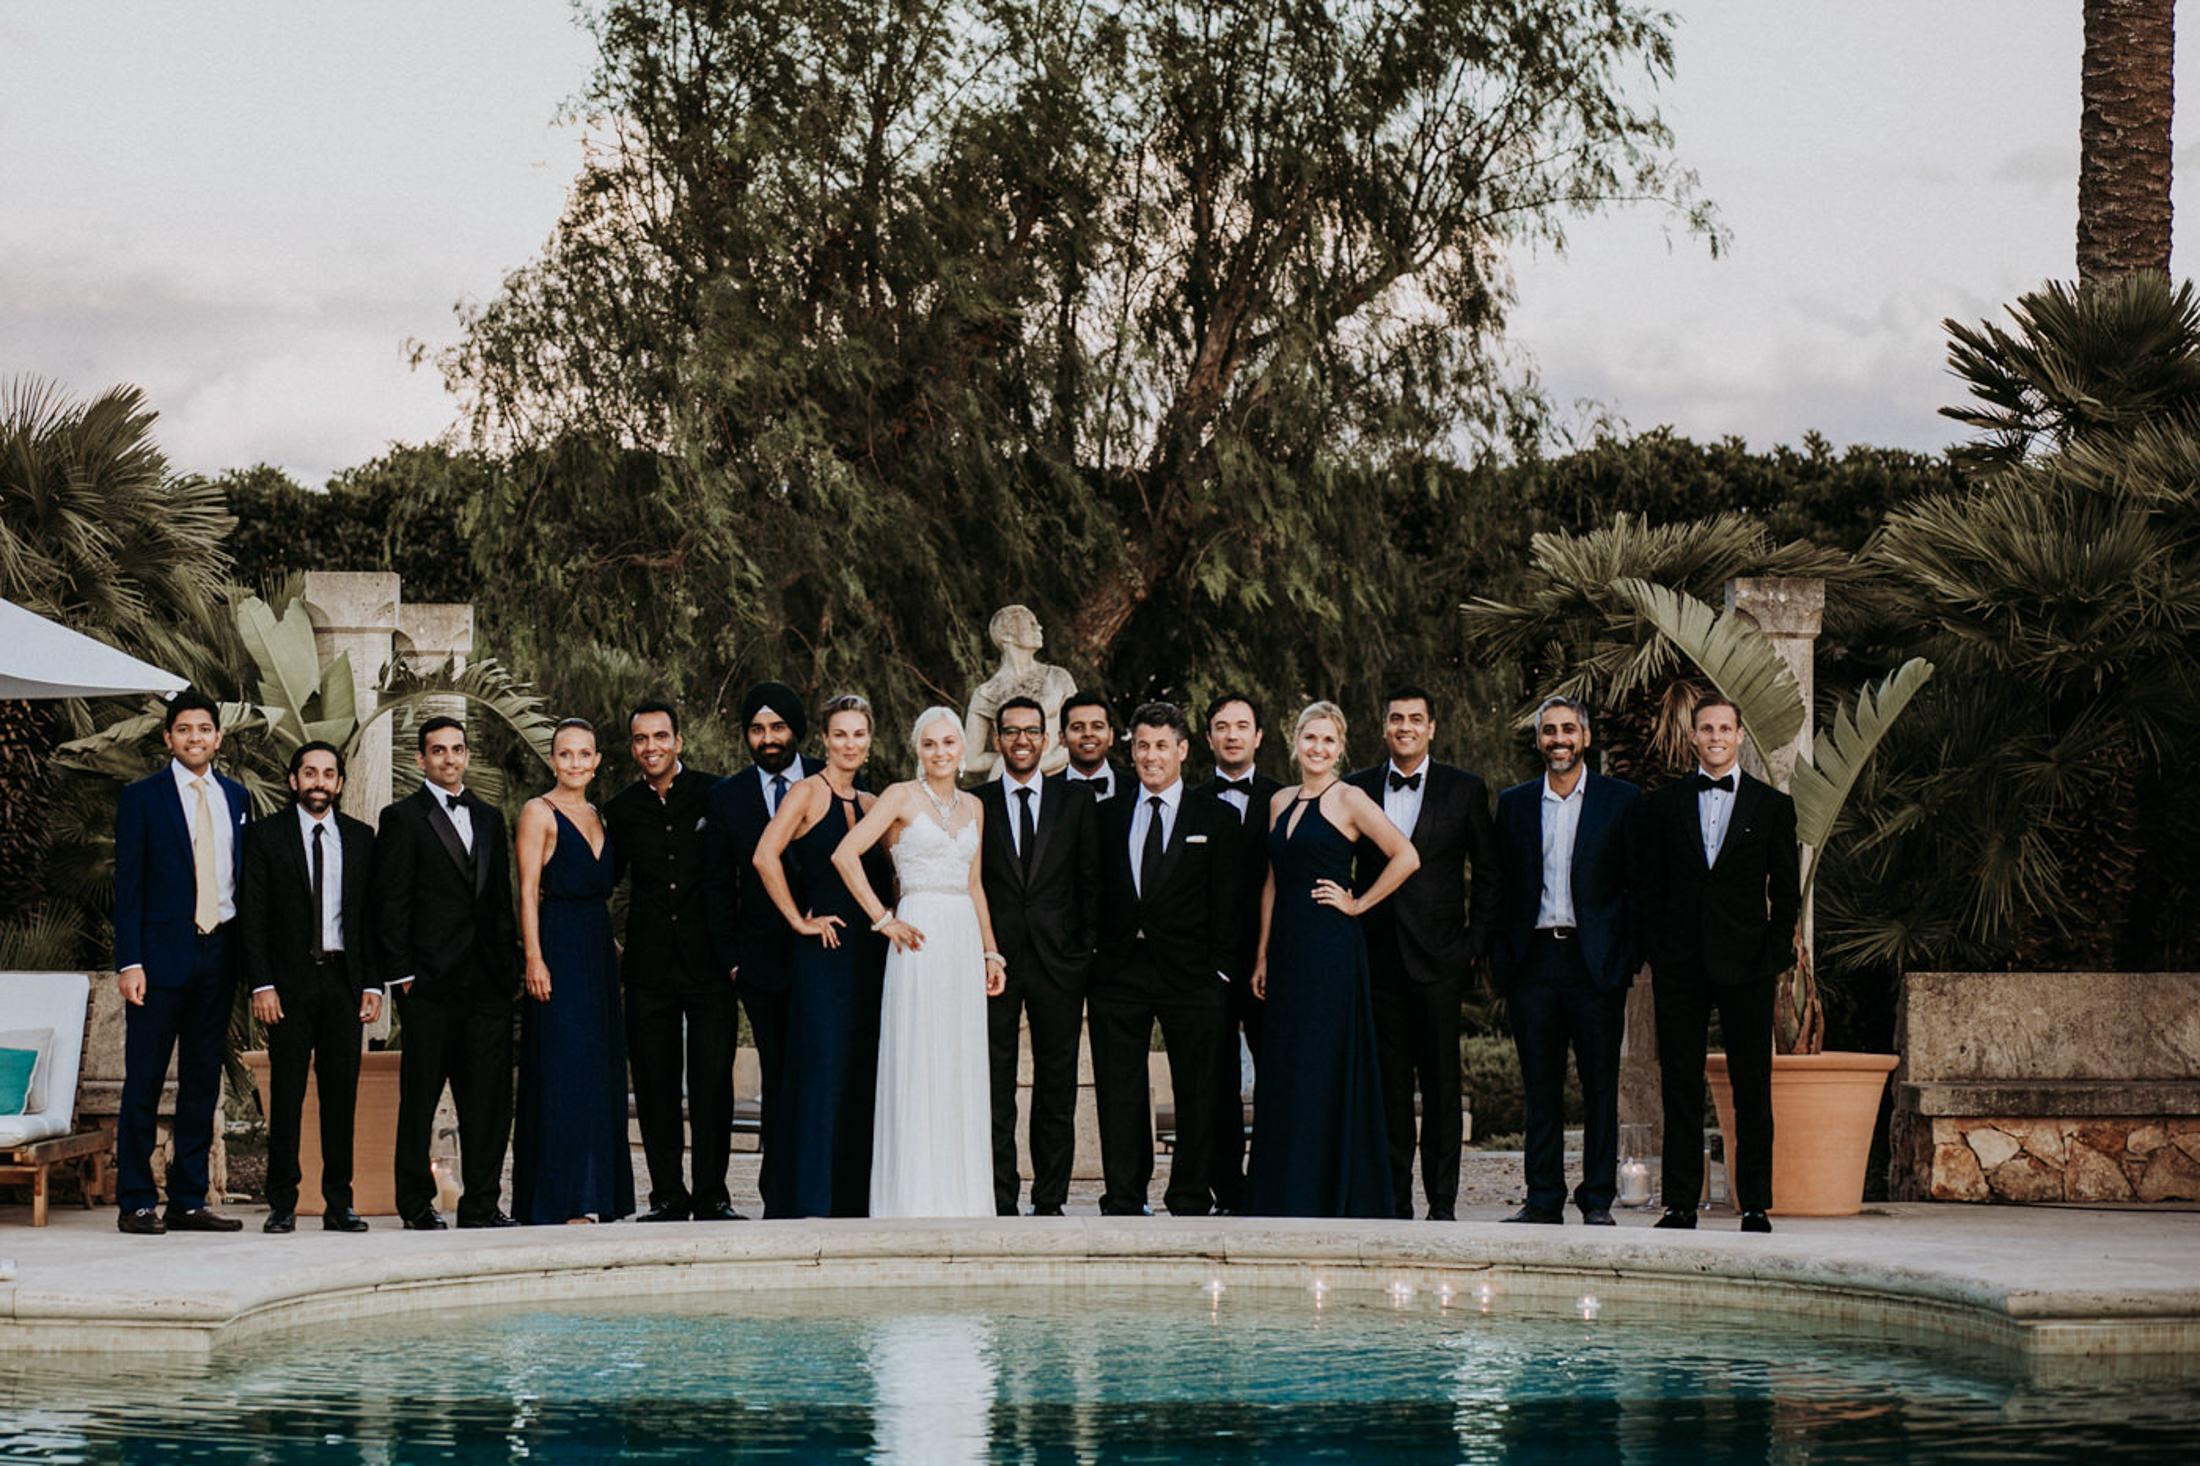 Wedding_Photographer_Mallorca_Daniela-Marquardt_Photography_New_York_Iceland_Tuscany_Santorini_Portugal_Austria_Bavaria_Elopement_Hochzeitsfotograf_AntjeRajat2_108